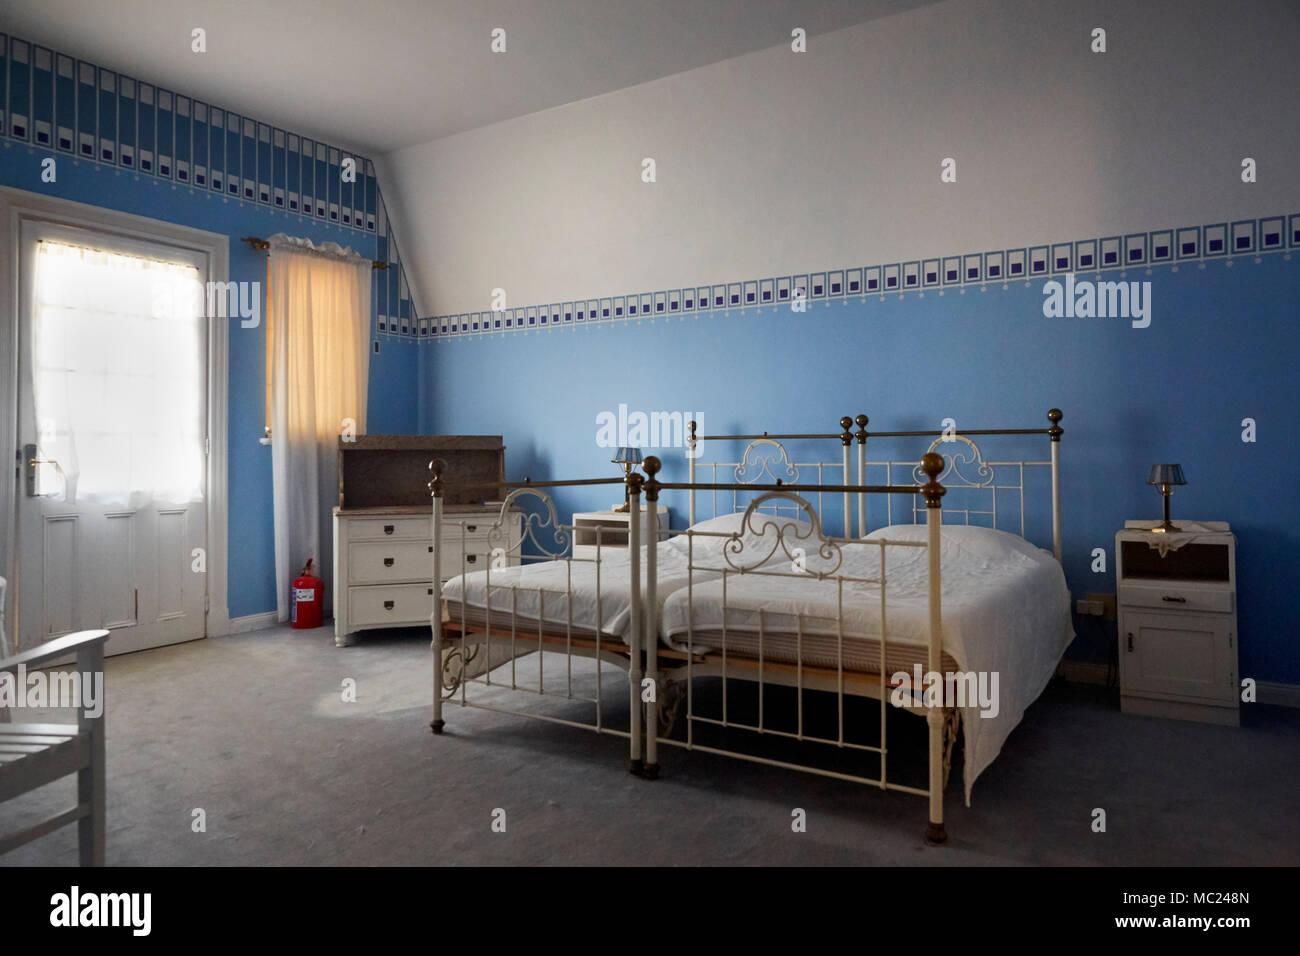 Schlafzimmer in Goerke Goerke Haus (Haus) in Lüderitz, Namibia ...